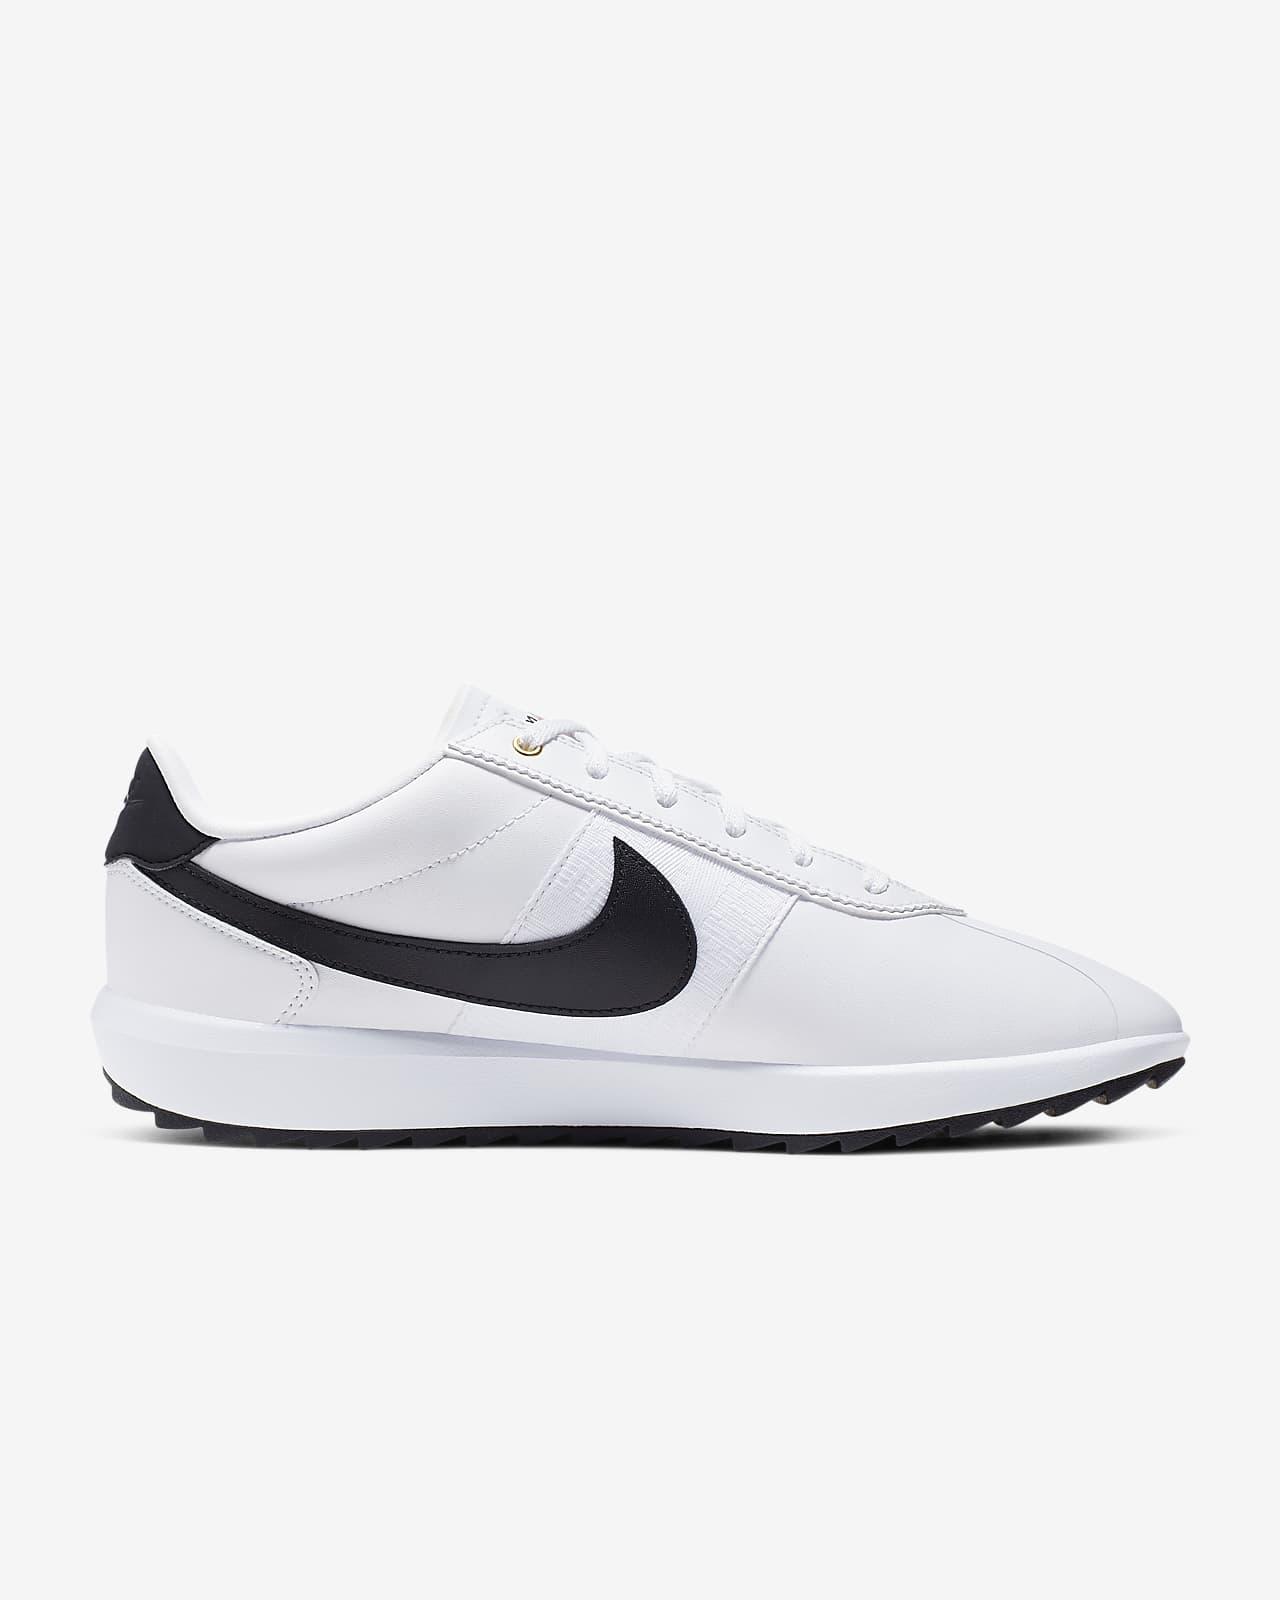 nike zapatos golf mujer